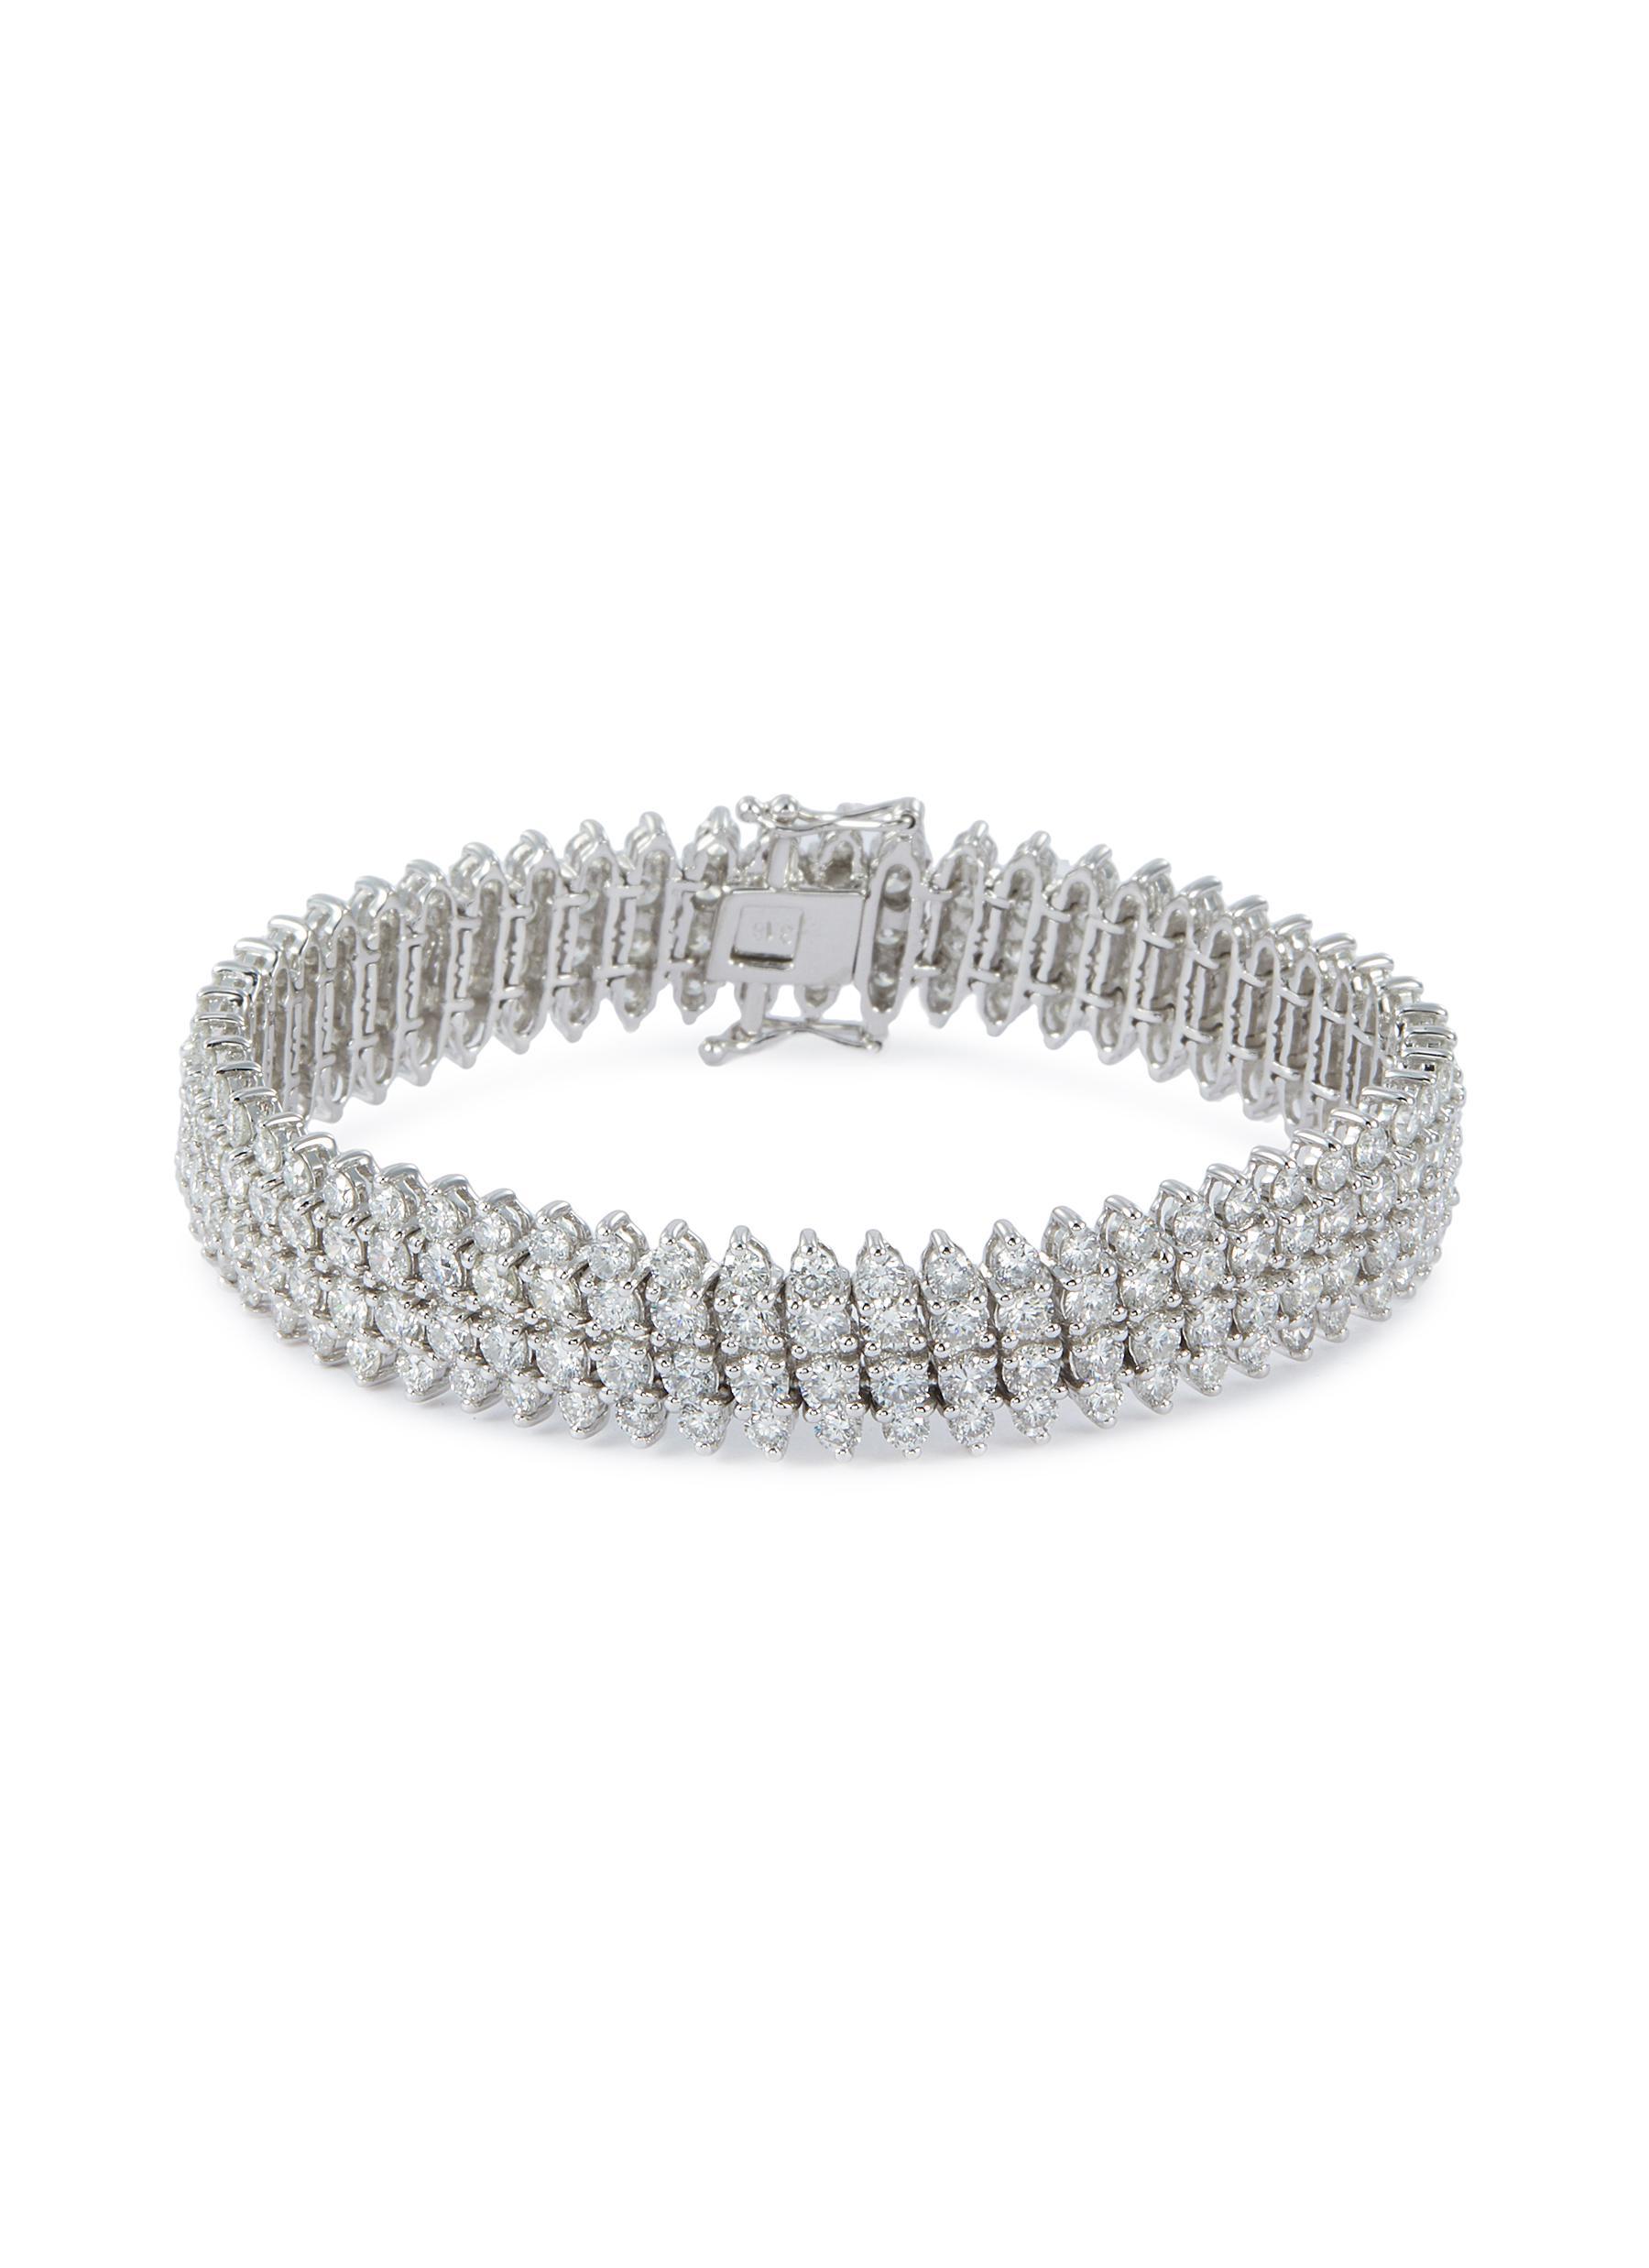 Diamond 18k white gold link bracelet